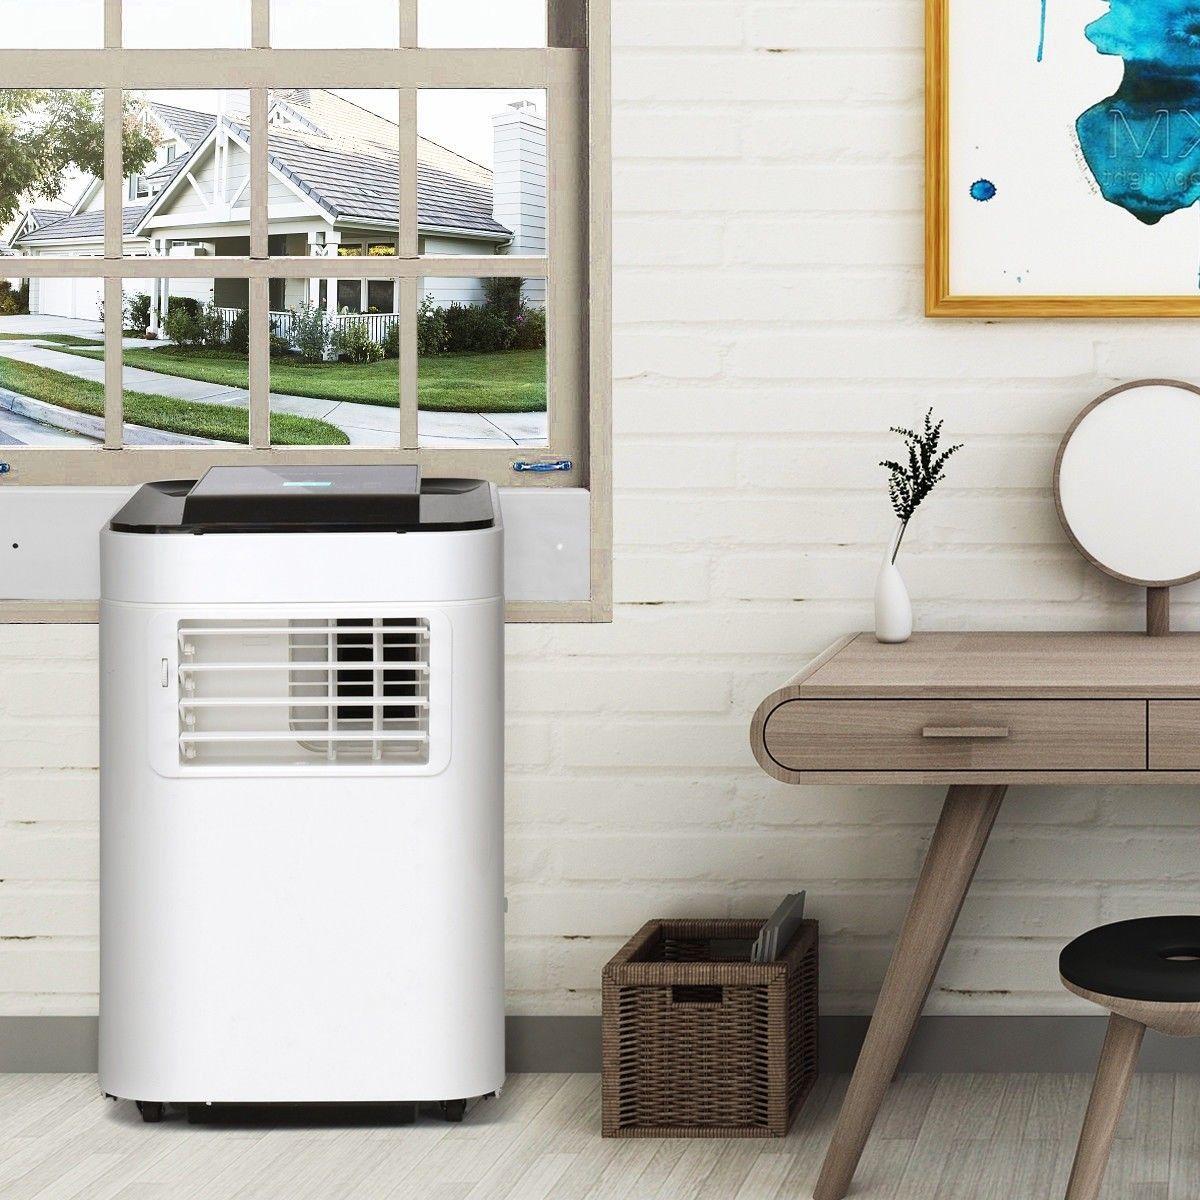 Portable Air Conditioner 10000BTU AC Unit & Dehumidifier w